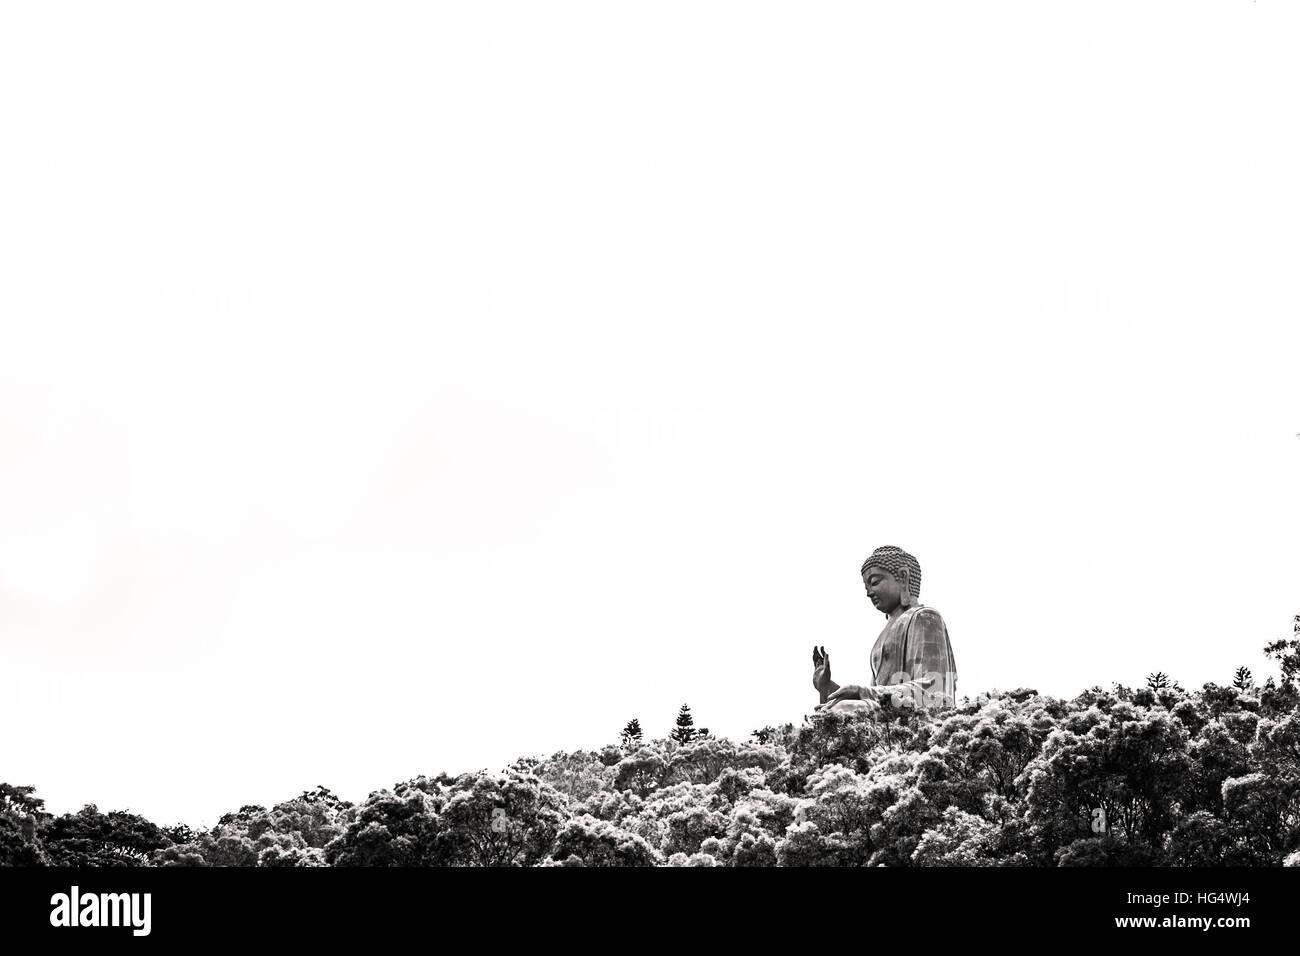 Black and white profile picture of Big Buddha on Lantau Island, Hong Kong - Stock Image